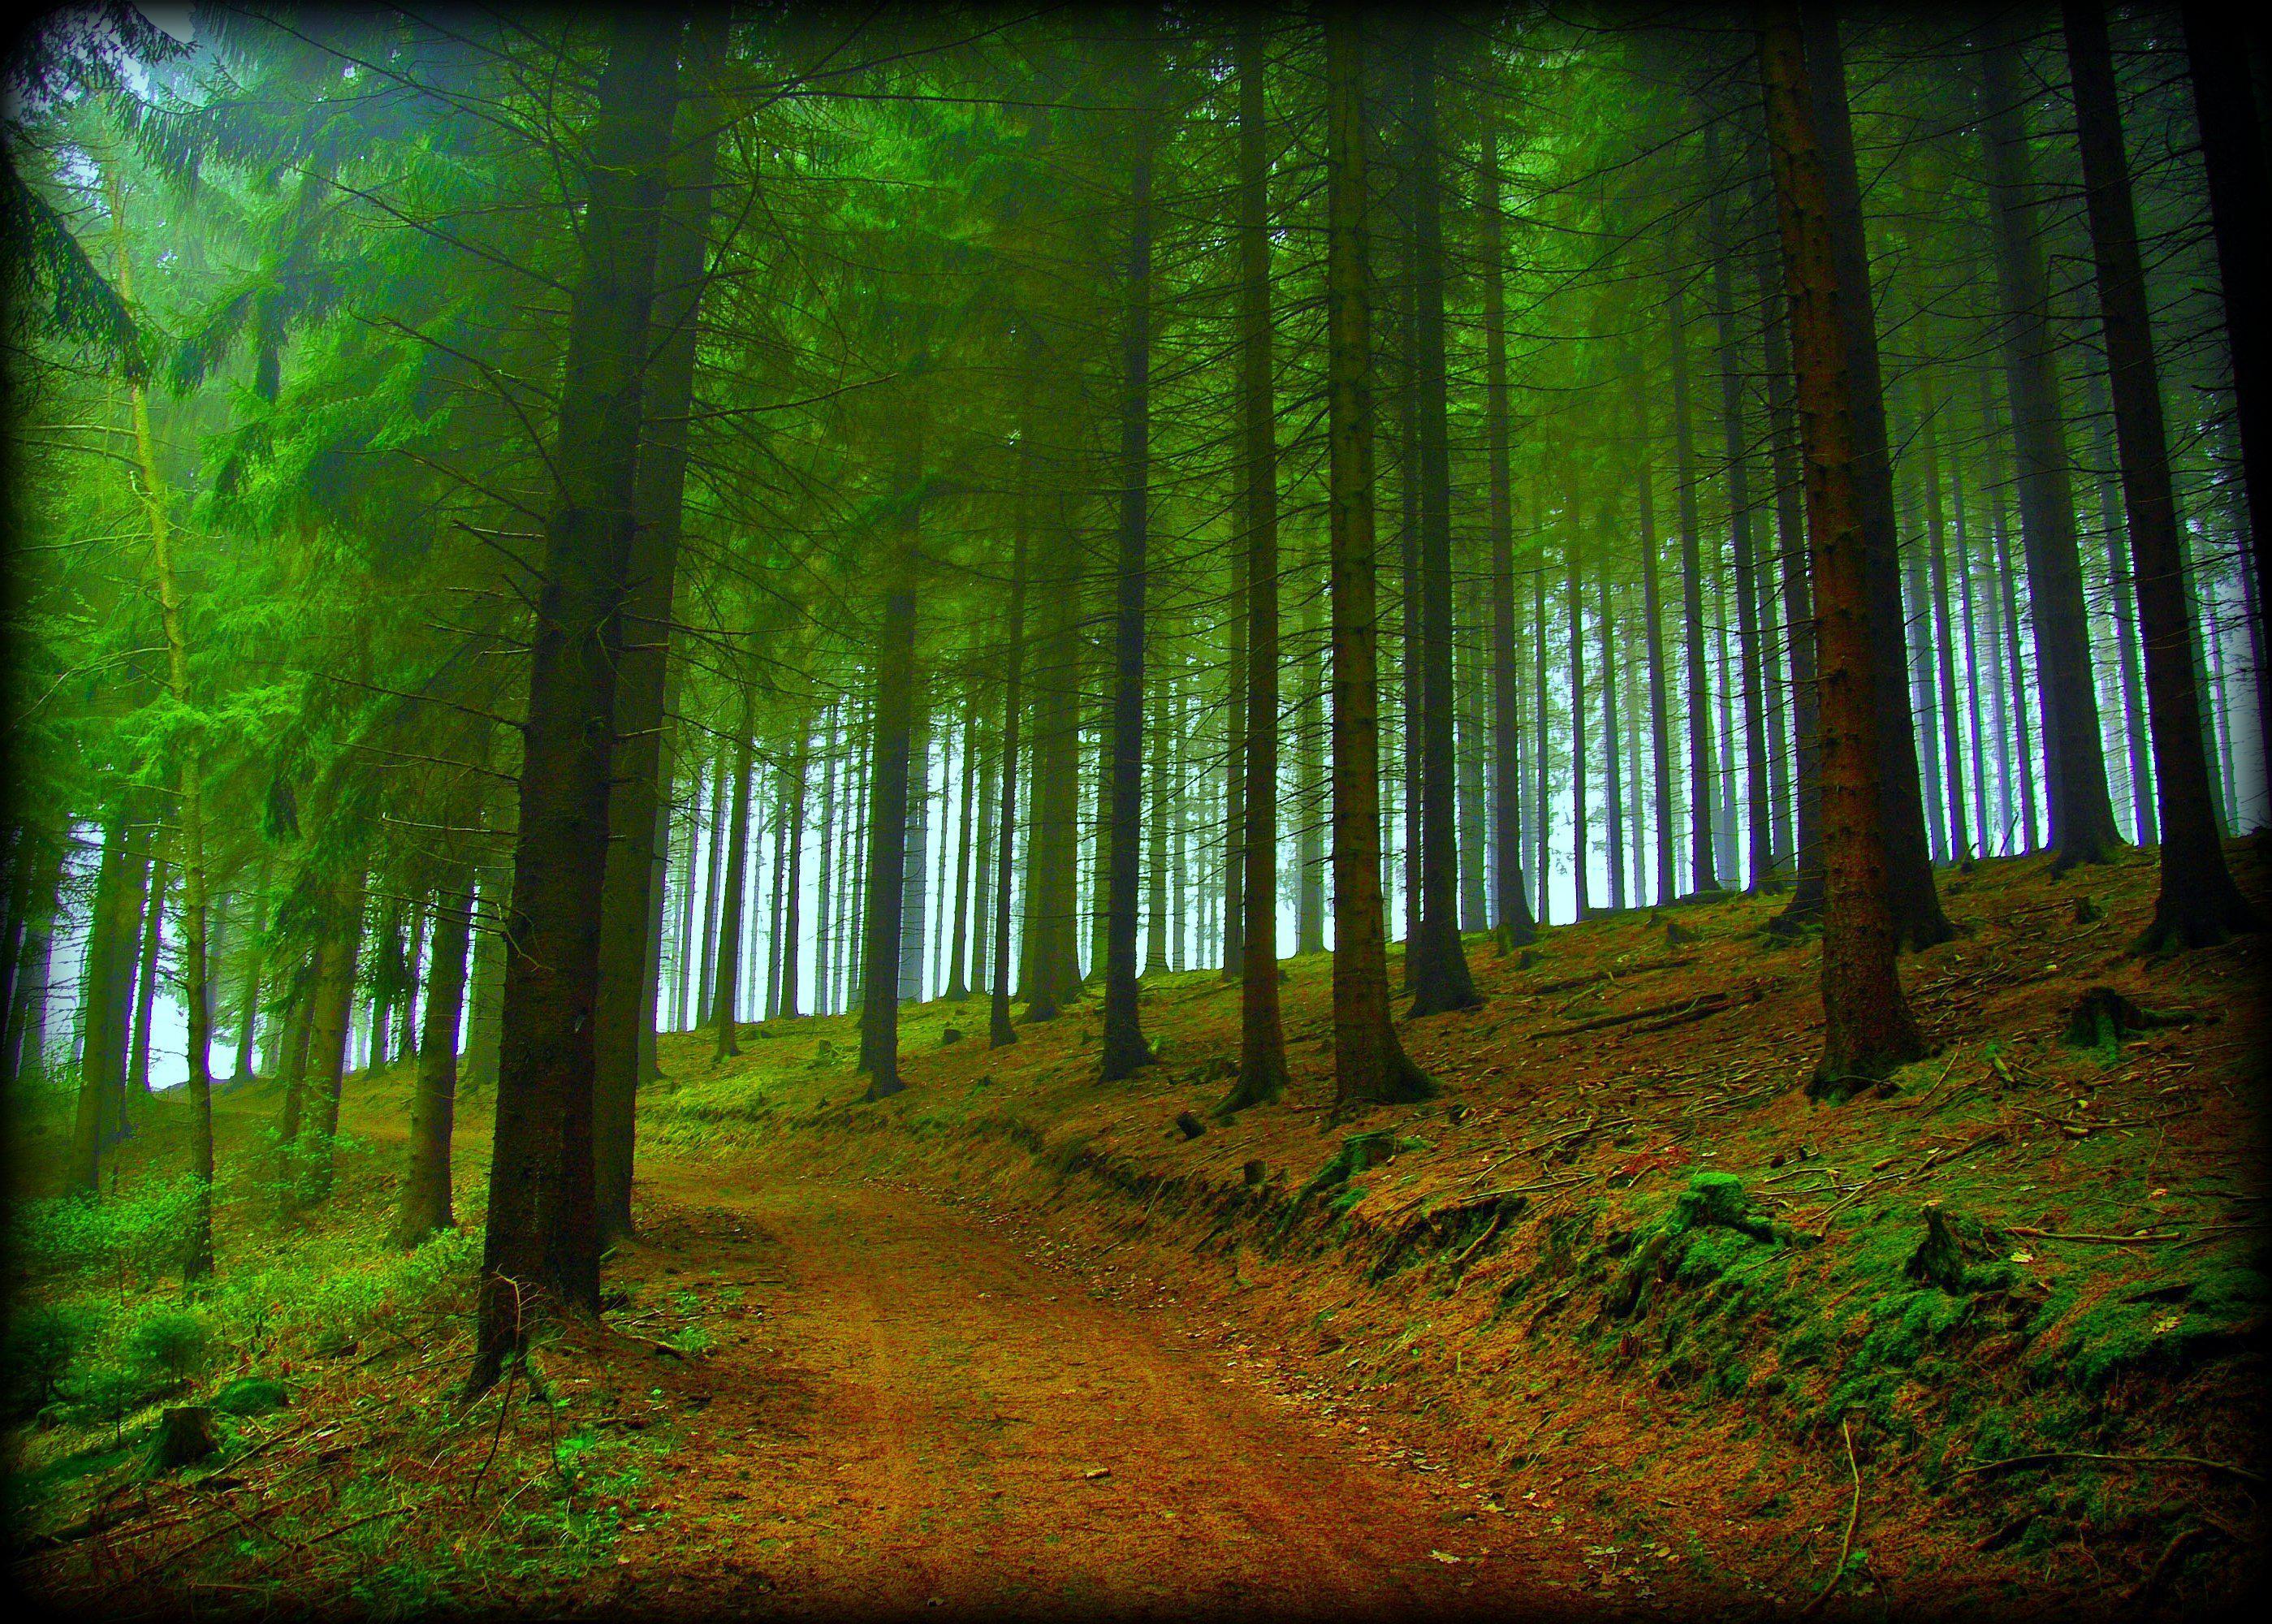 Hd Forest Trees Road Nature Fog Free Desktop Background - Tree Forest Hd Background - HD Wallpaper